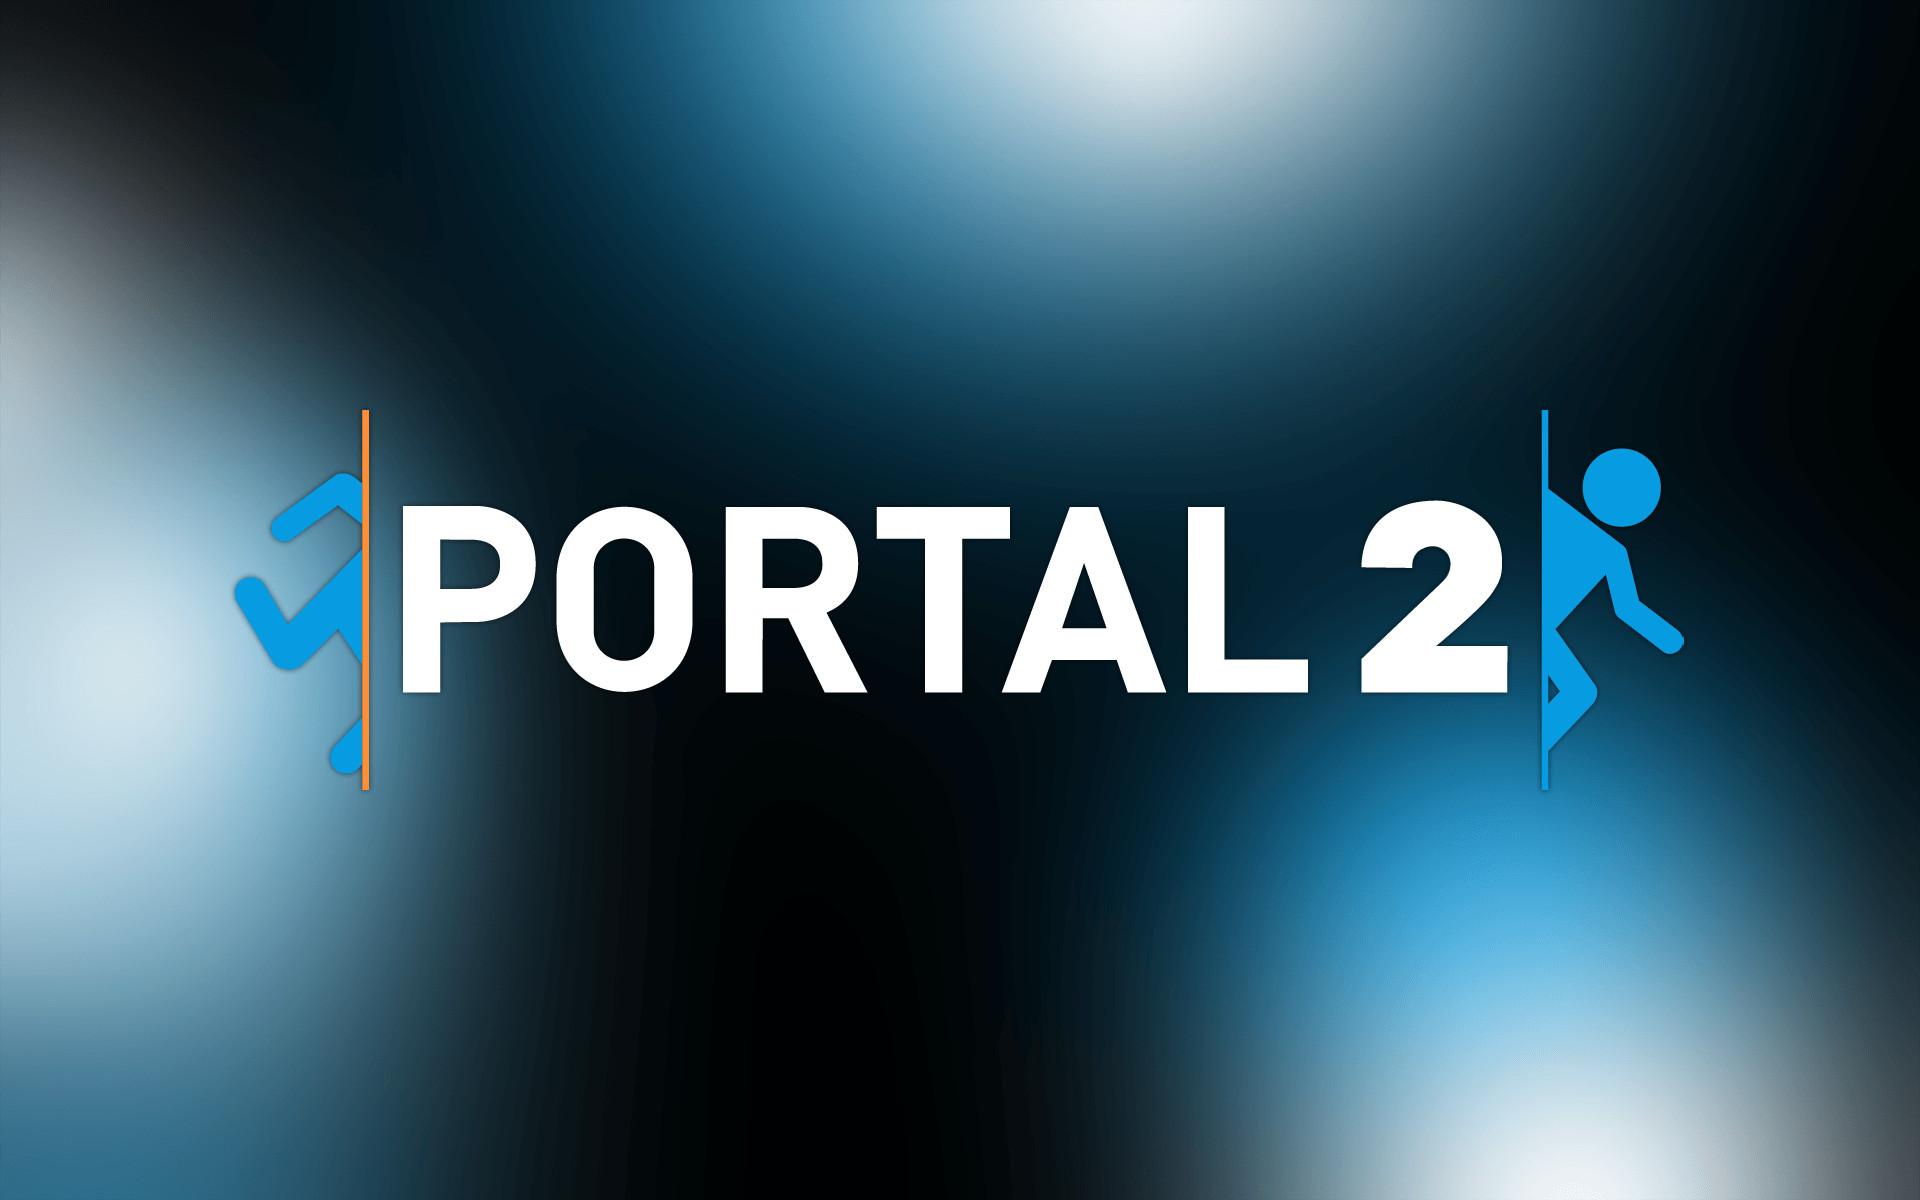 Portal2 Wallpapers – Full HD wallpaper search